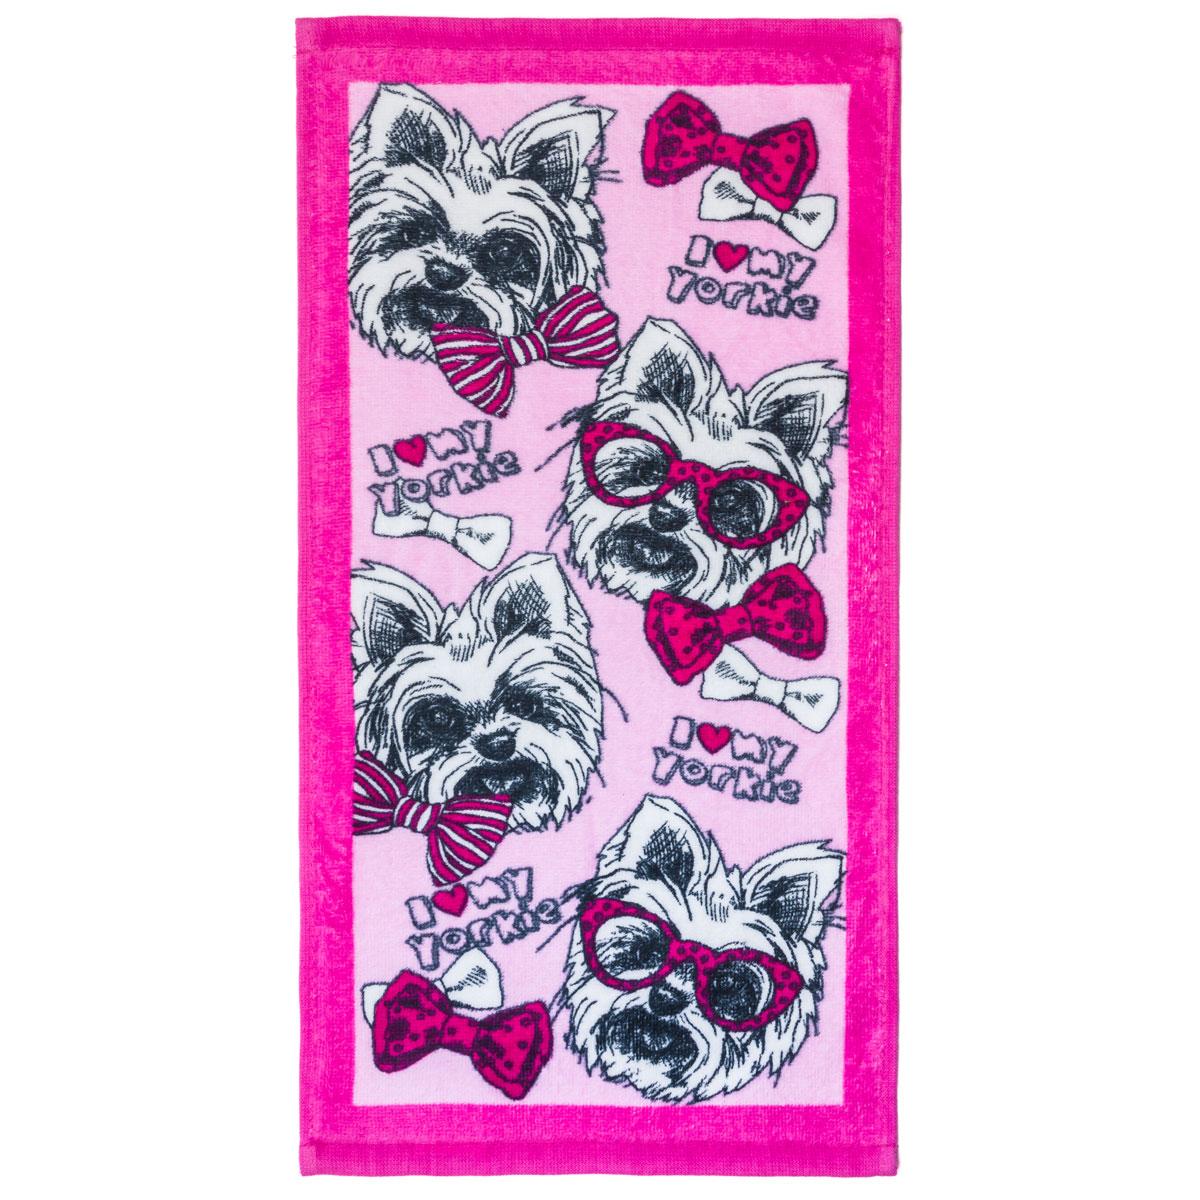 Полотенце арт. 04-0081 Фиолетовый р. 25х50Махровые полотенца<br>Плотность ткани: 330 г/кв. м<br><br>Тип: Полотенце<br>Размер: 25х50<br>Материал: Махра